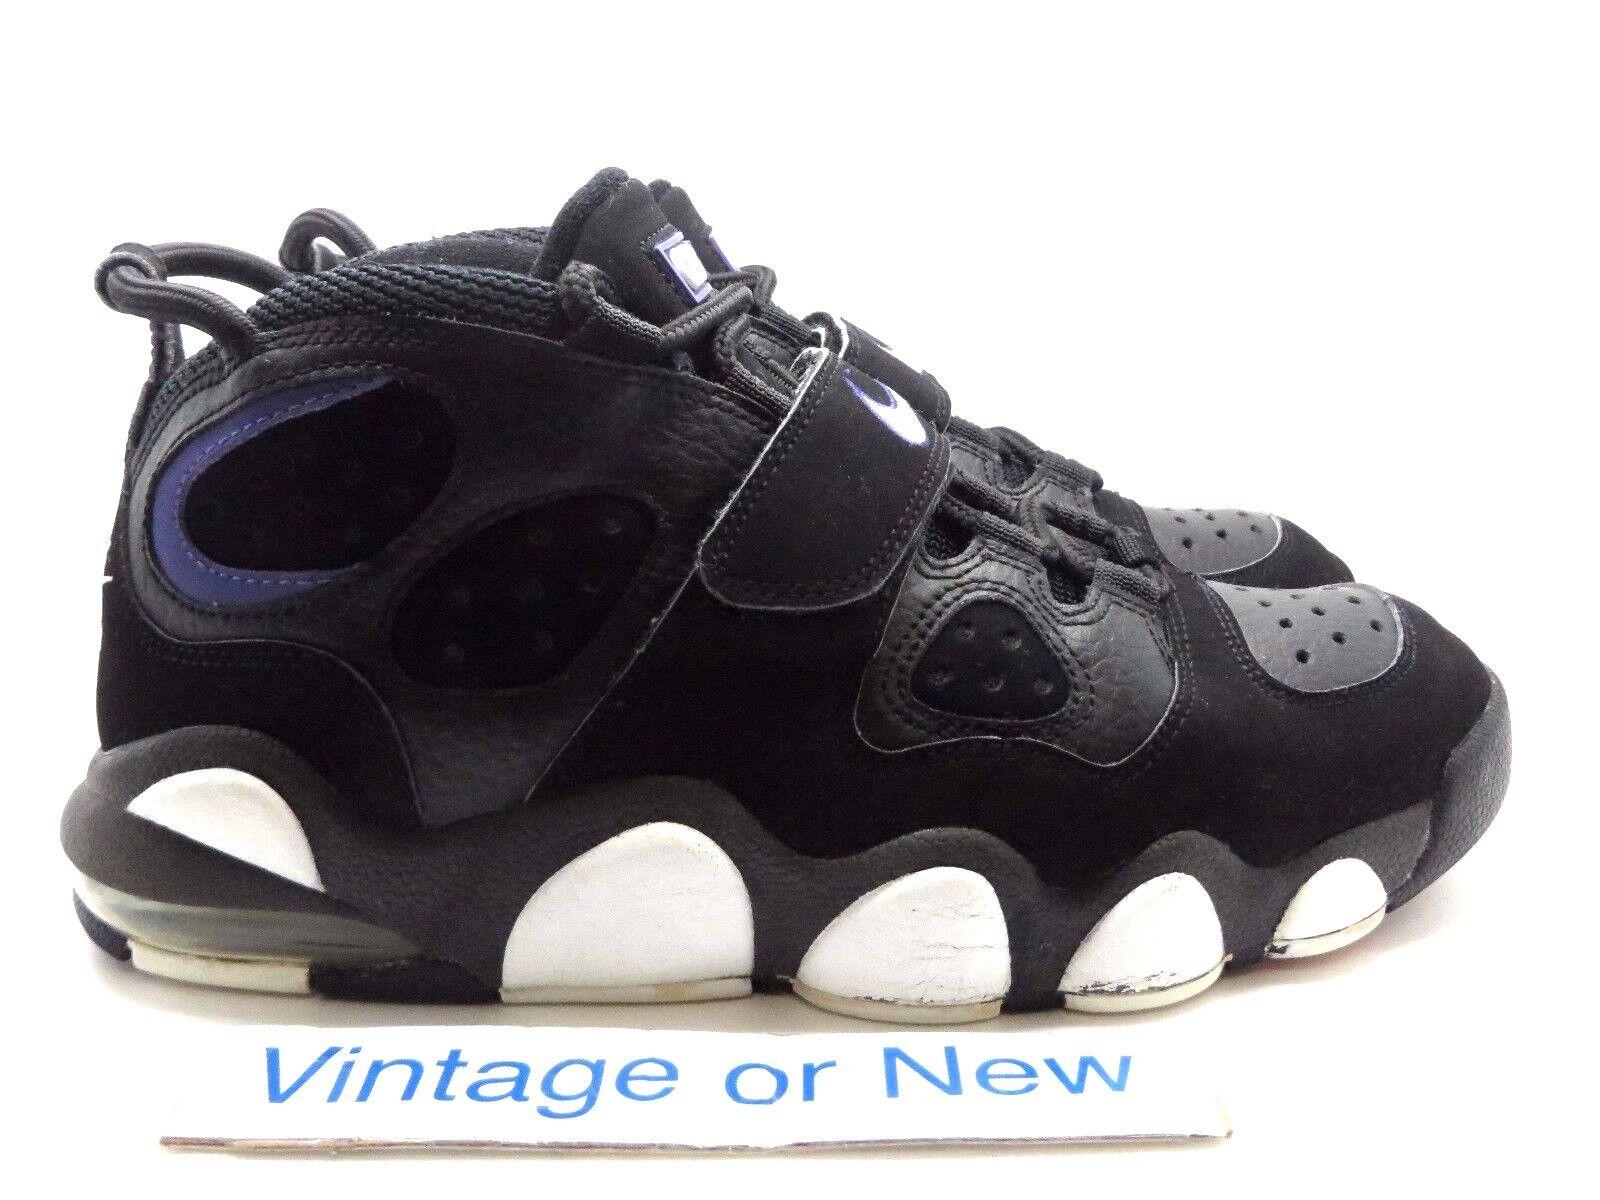 Nike Air Max CB34 Godzilla Charles Barkley 2007 sz 10